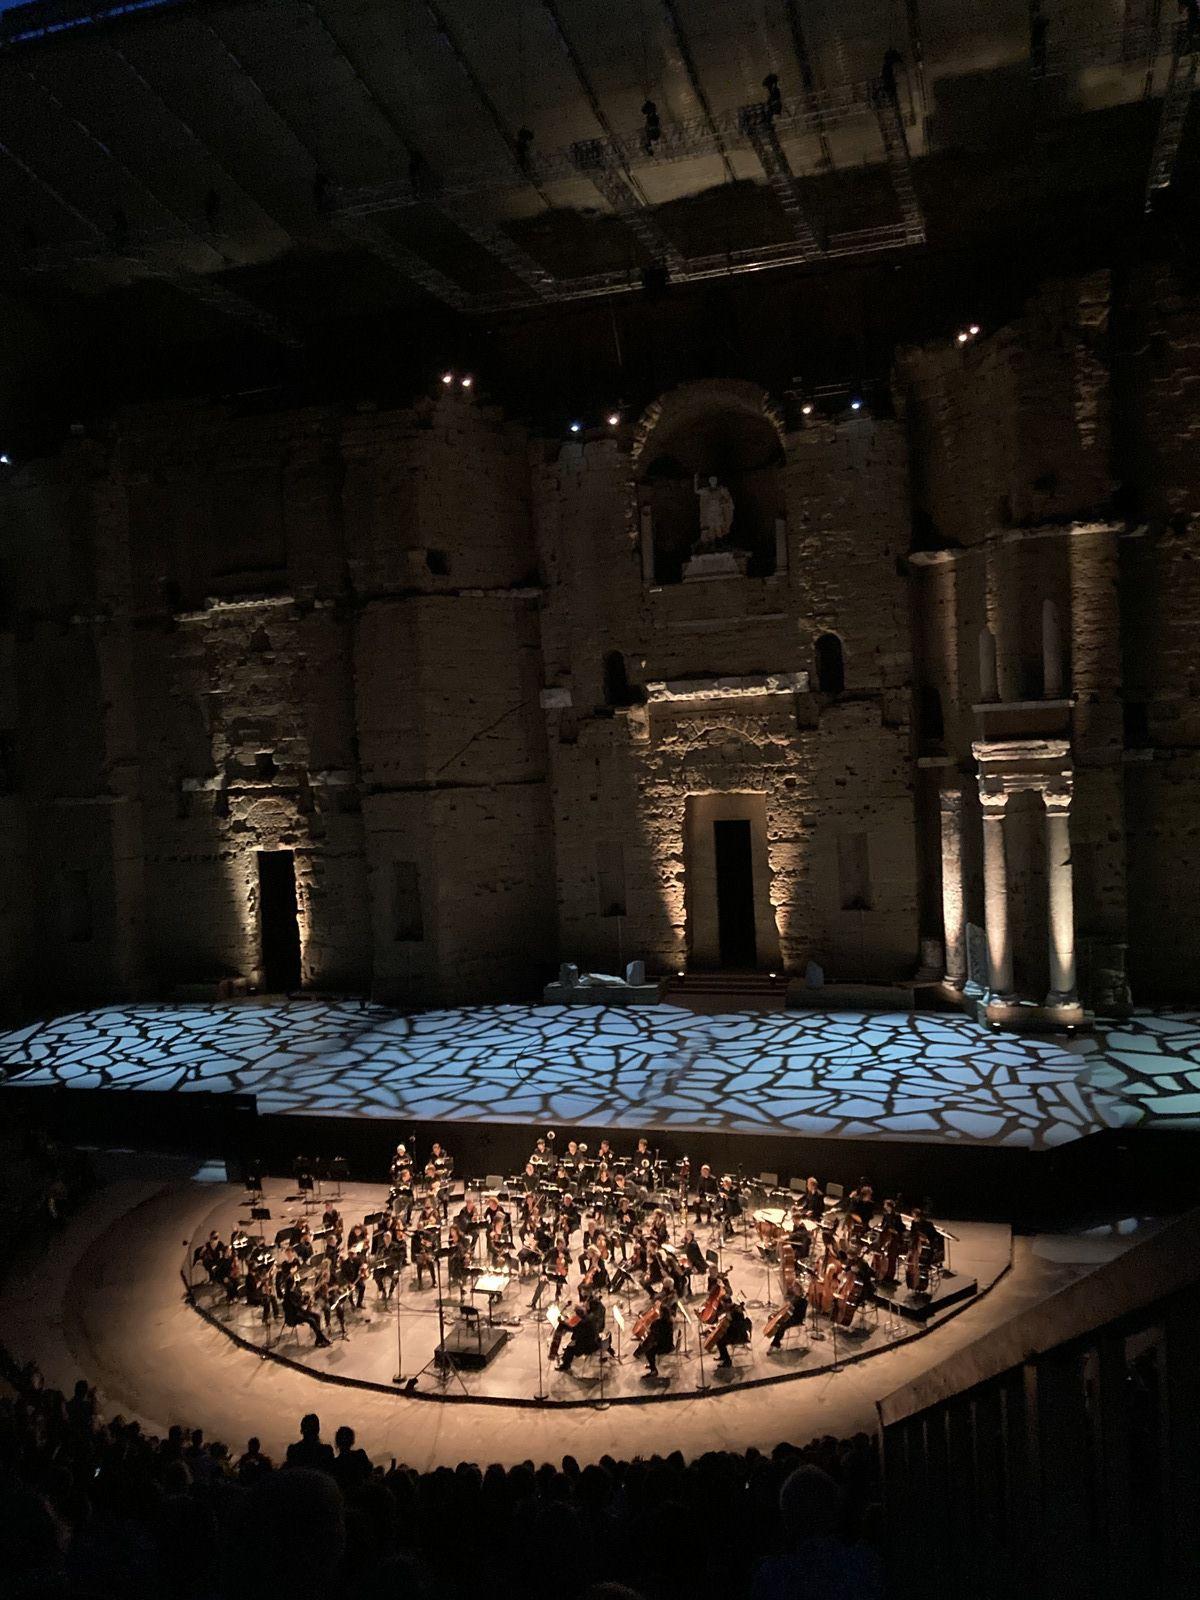 Orchestre philharmonique de Radio France, Mikko Franck, Maxim Vengerov, violon